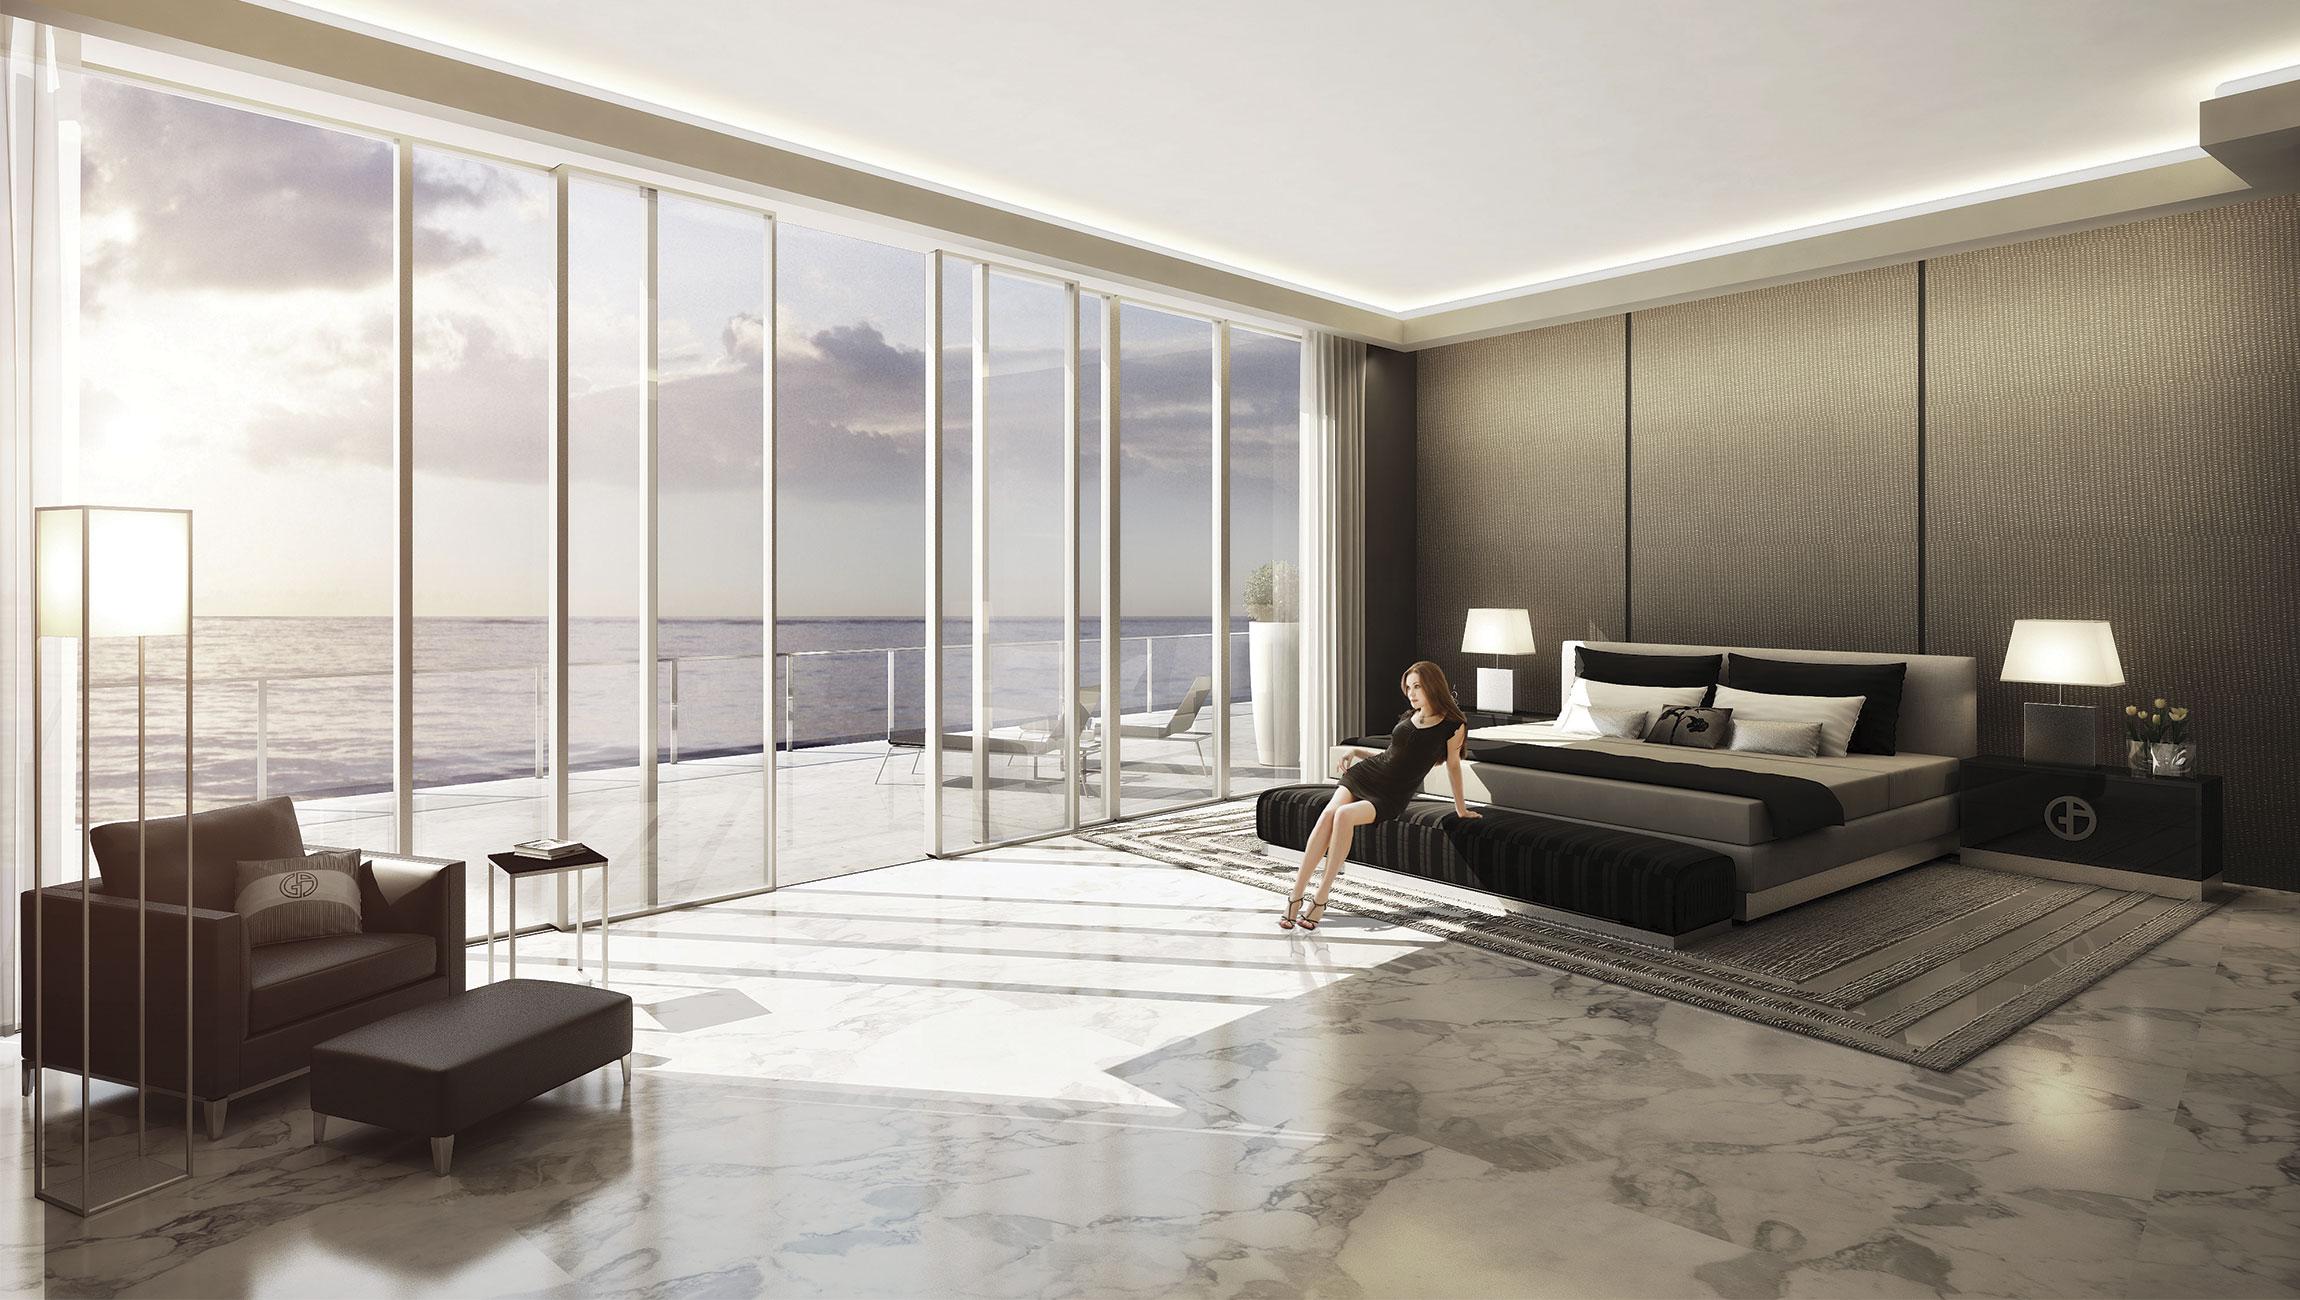 Armani Residences New luxury preconstruction condos in Miami